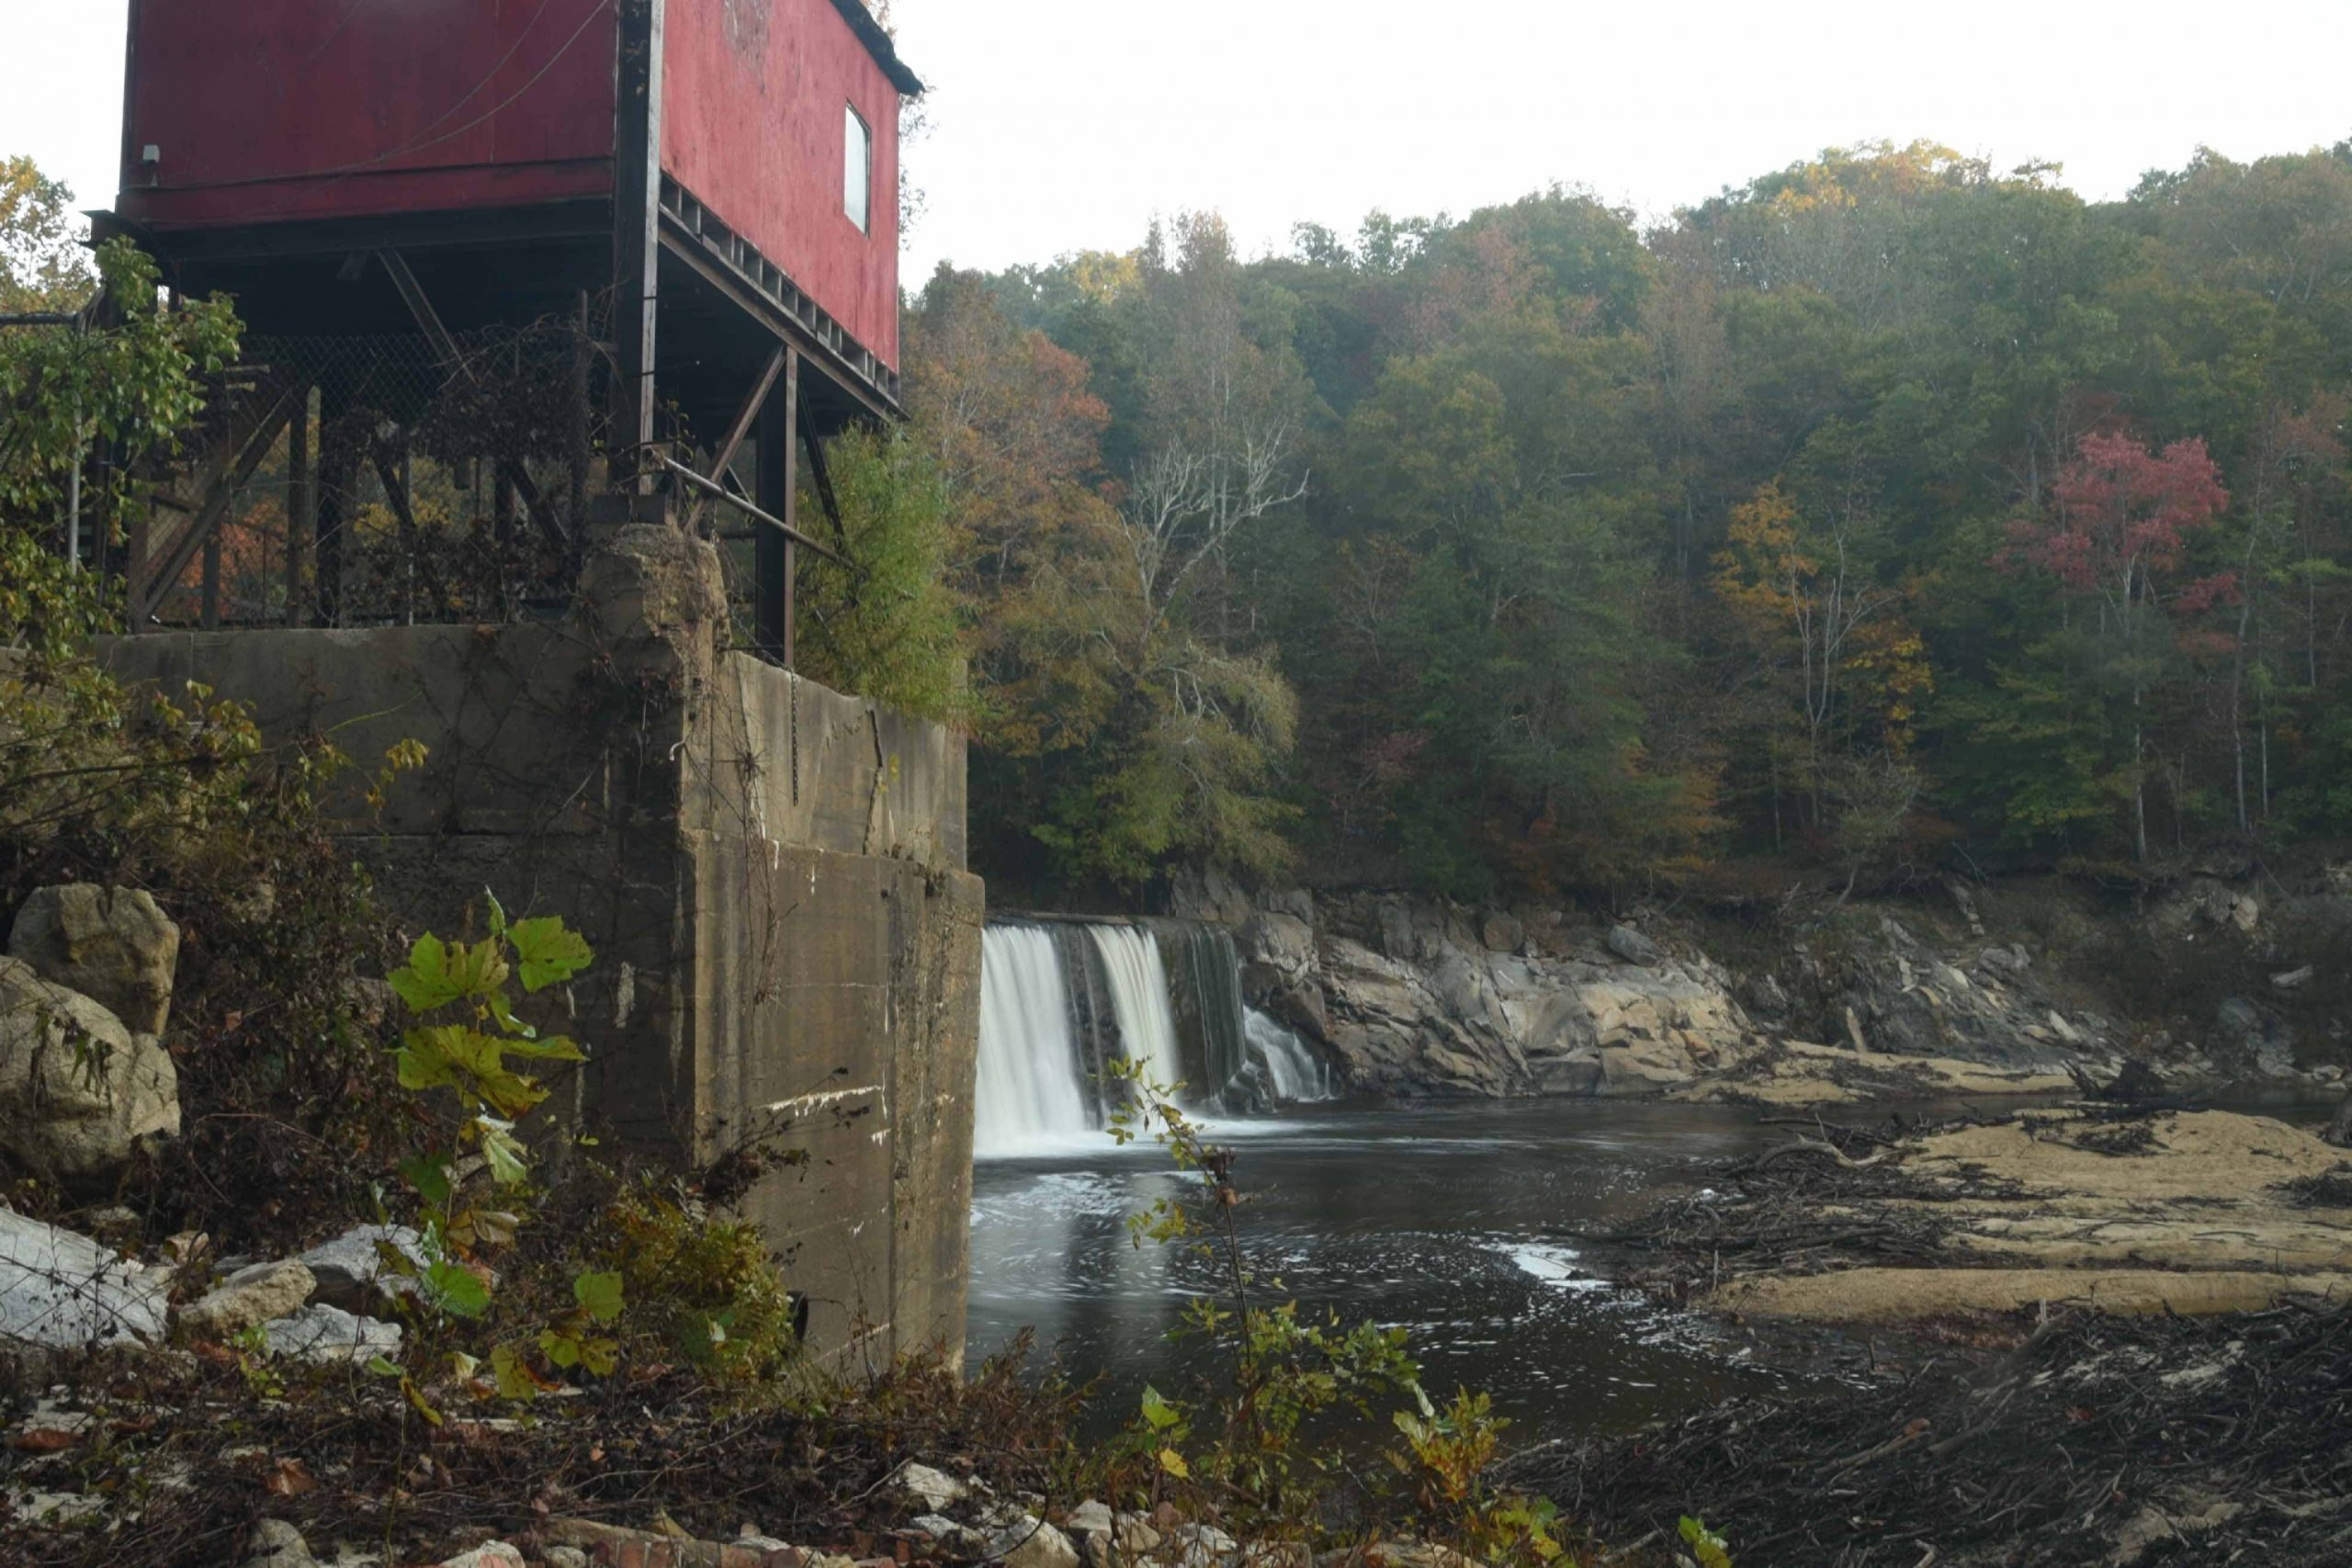 Whittle's Mill Dam